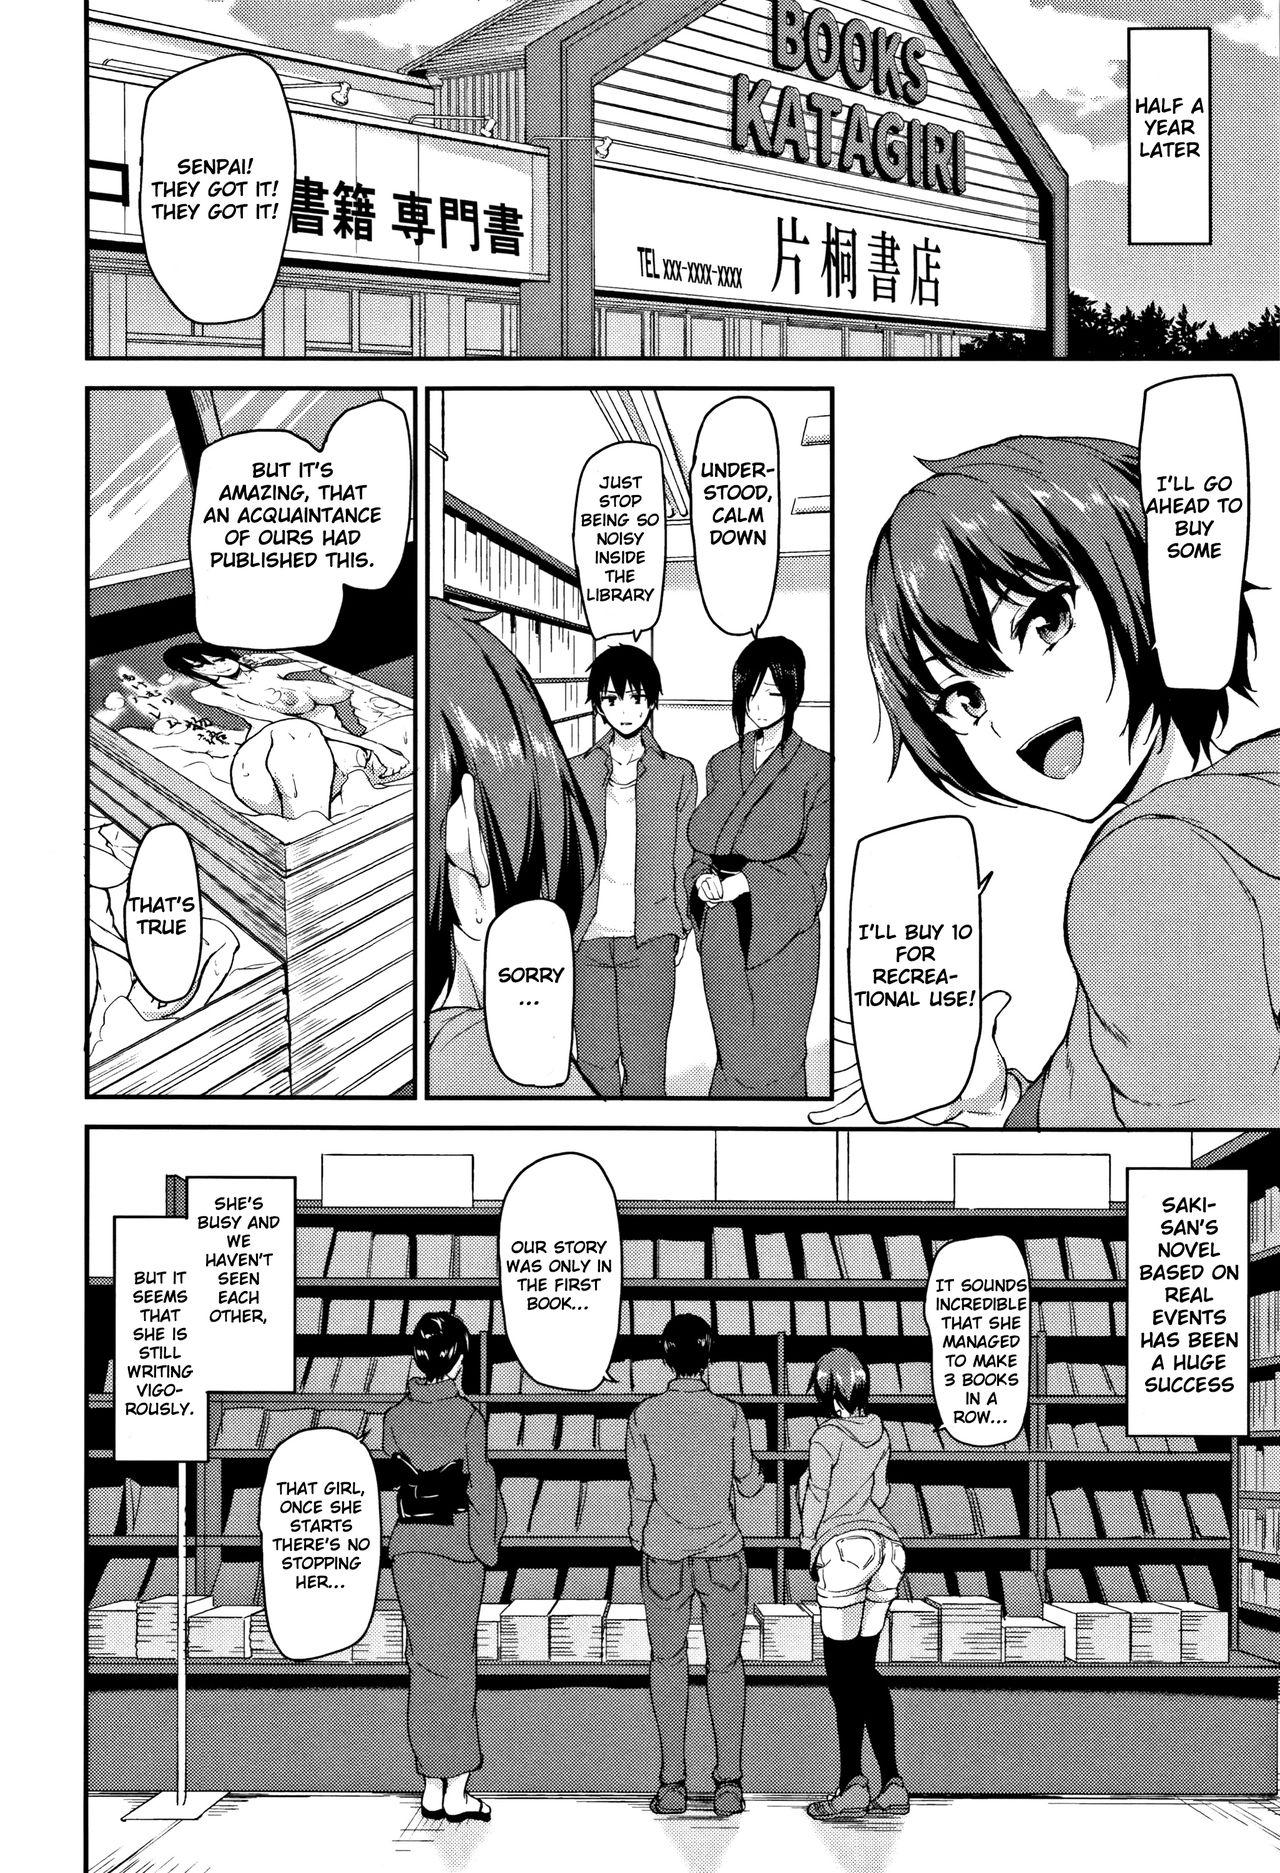 Yukemuri Harem Monogatari Saishuuwa | Yukemuri Harem Monogatari Final Chapter 35